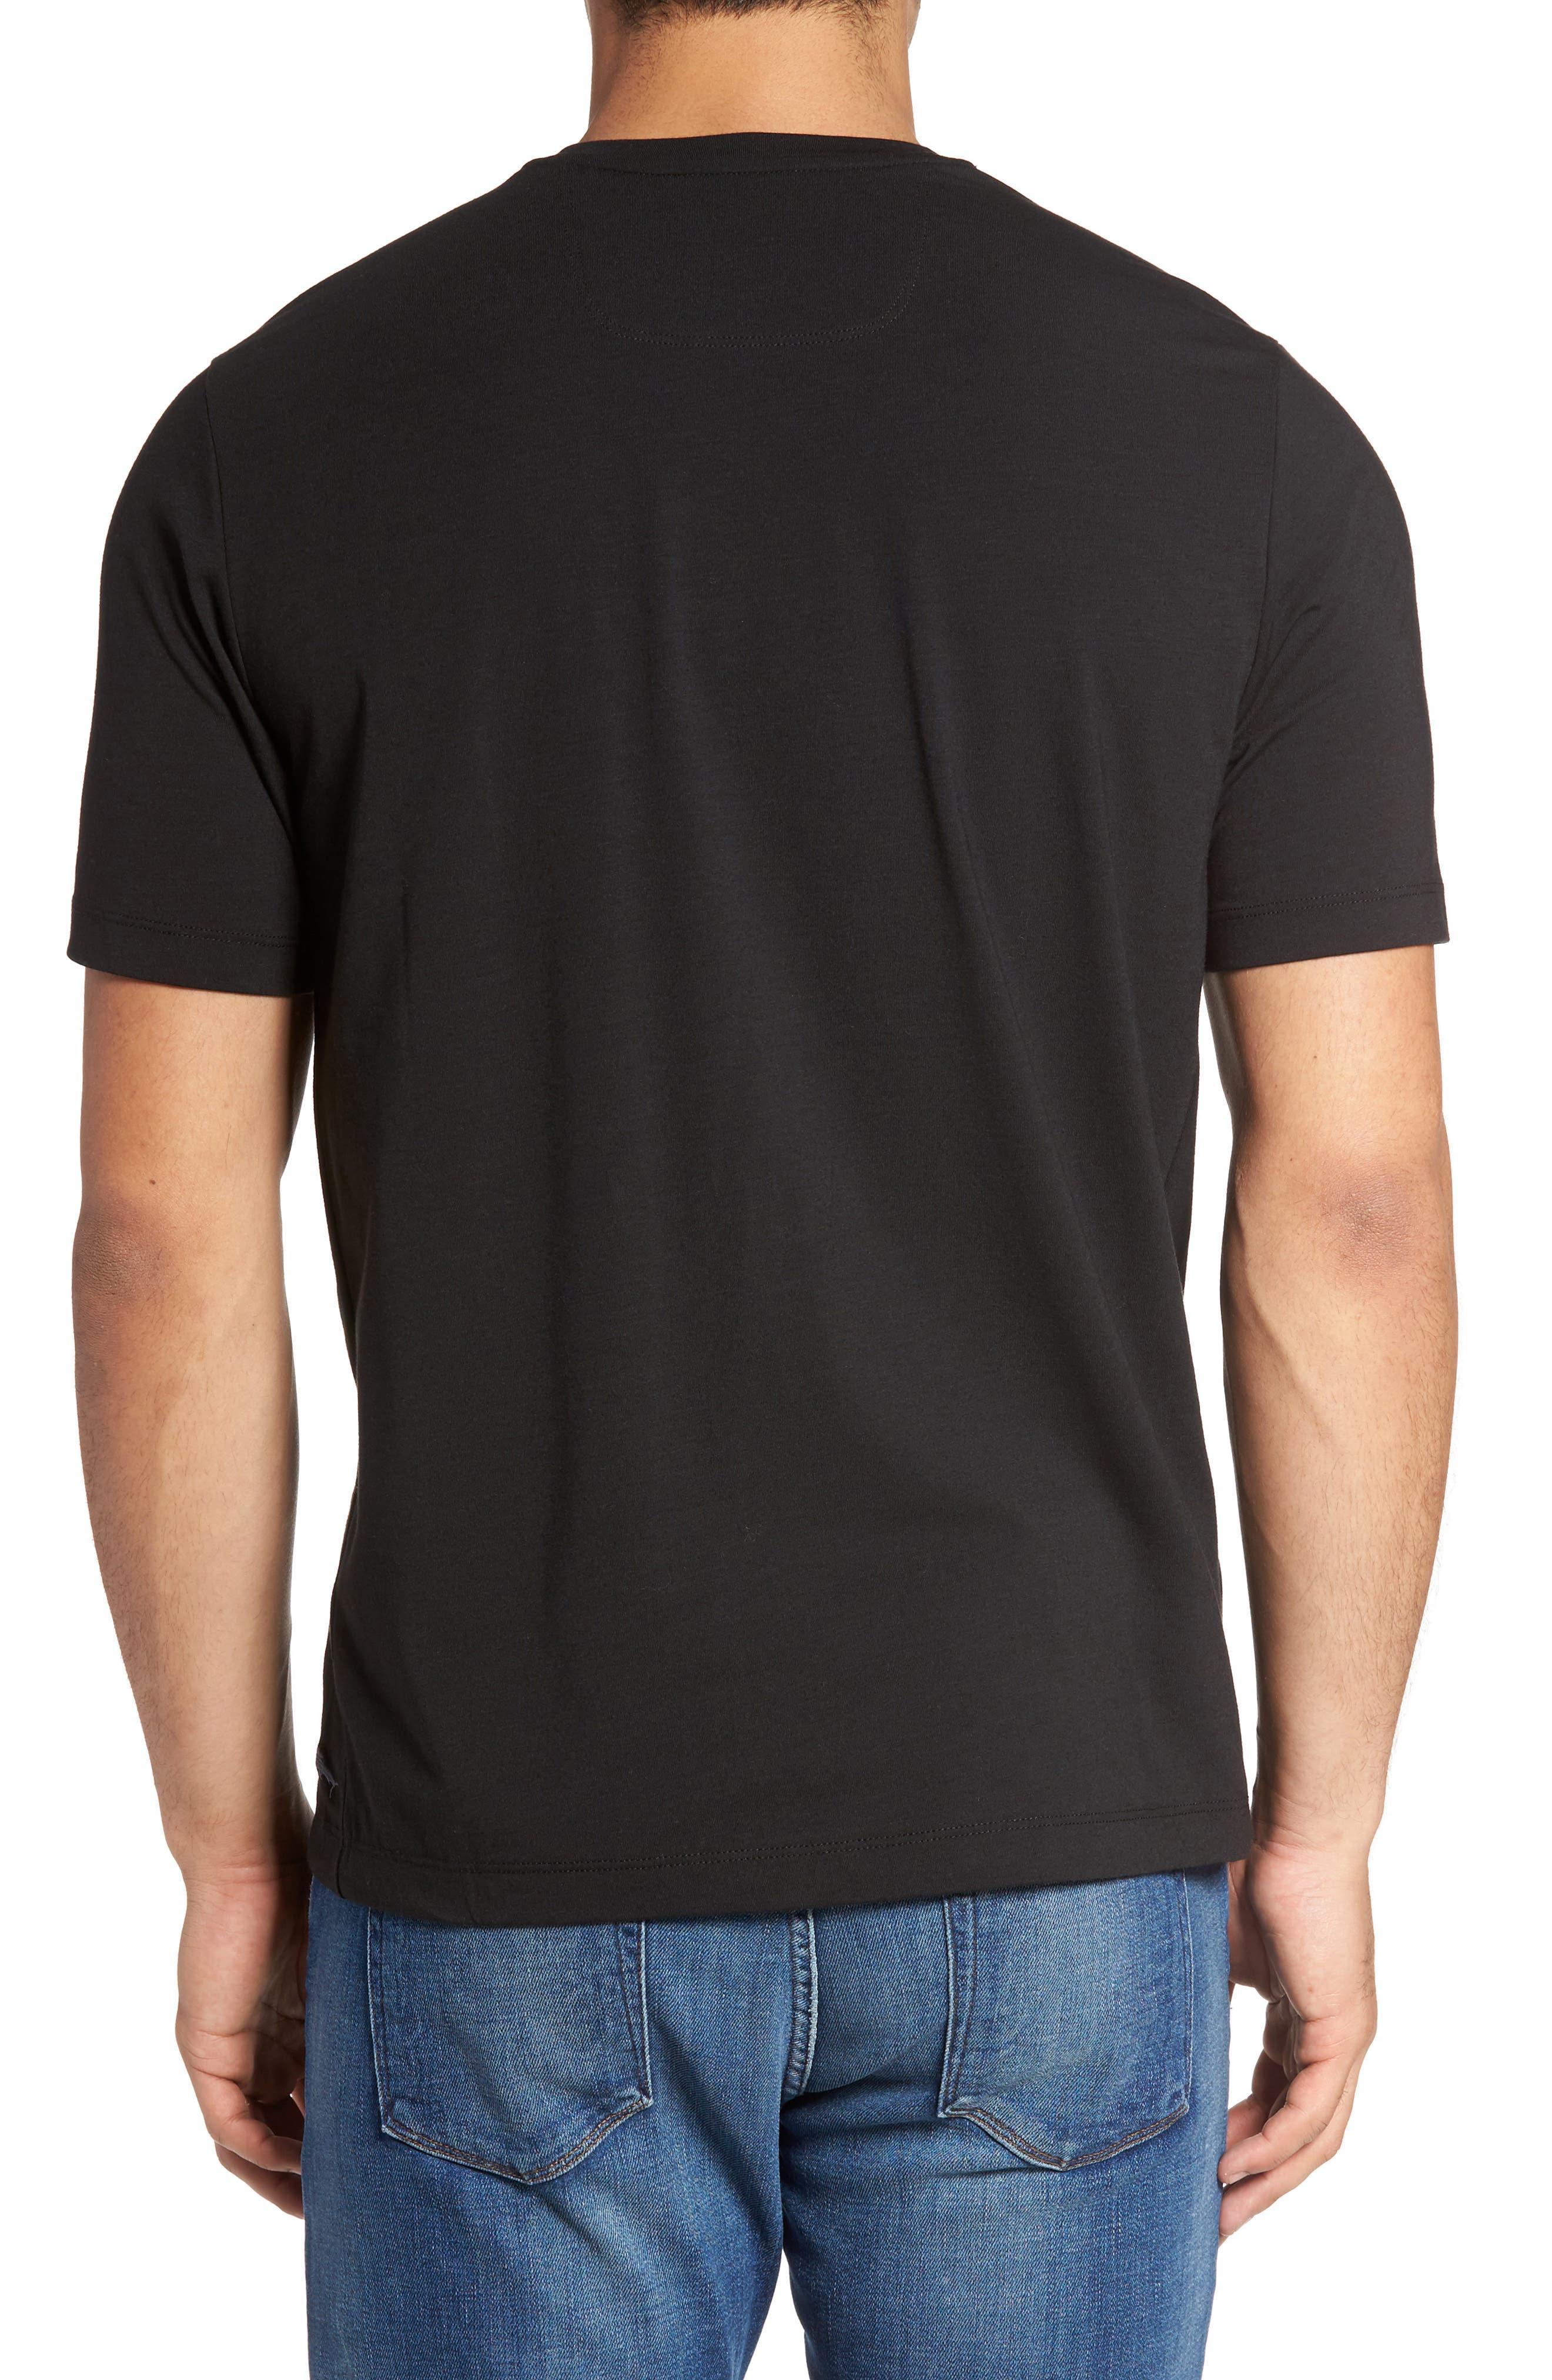 Tropicool T-Shirt,                             Alternate thumbnail 15, color,